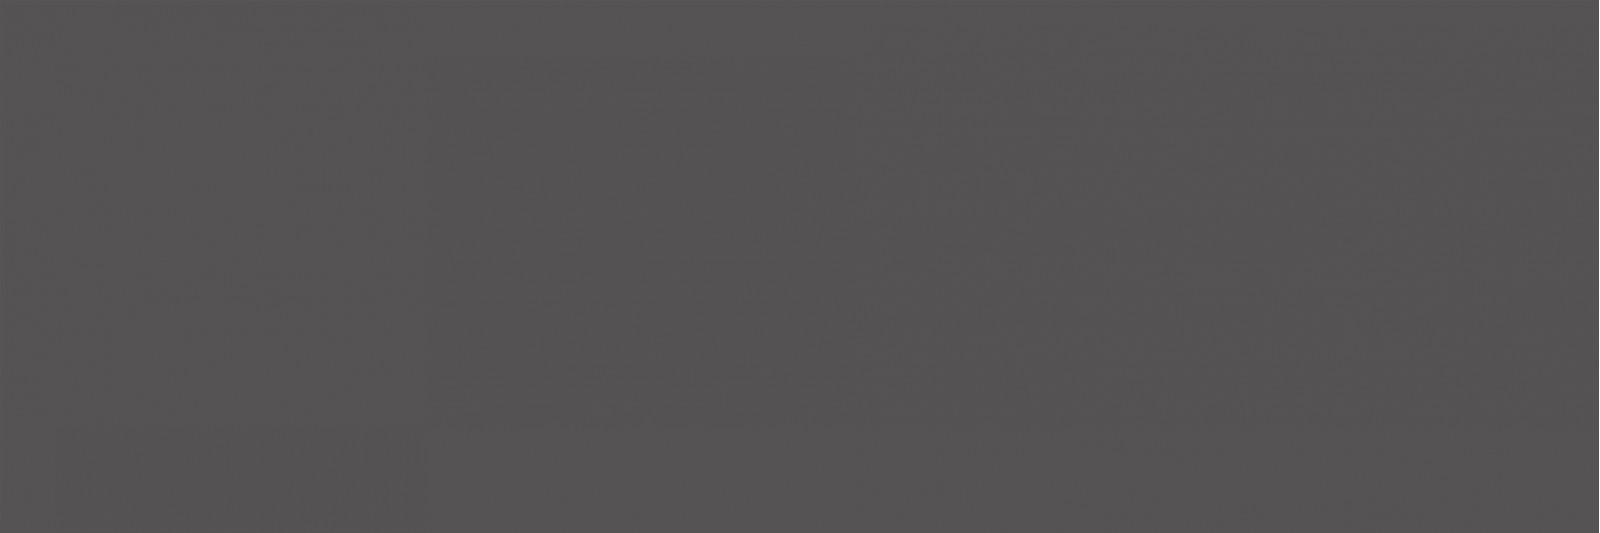 Стенни плочки Colorplay Anthracite 30x90